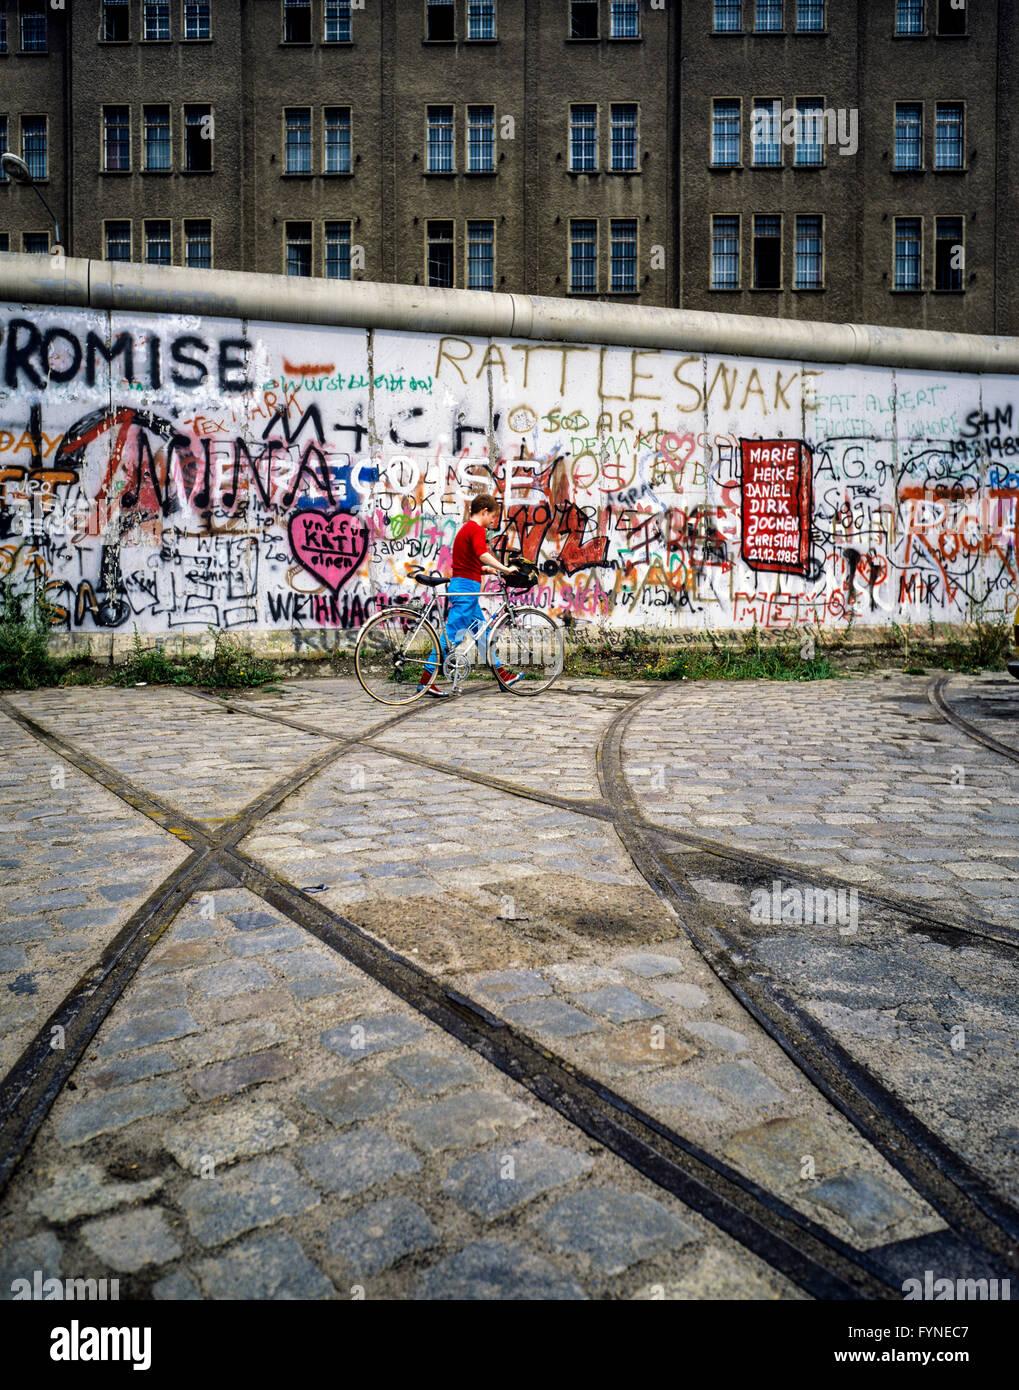 August 1986, Berlin Wall graffitis, tram track ending into wall, cyclist, East Berlin building, West Berlin side, - Stock Image